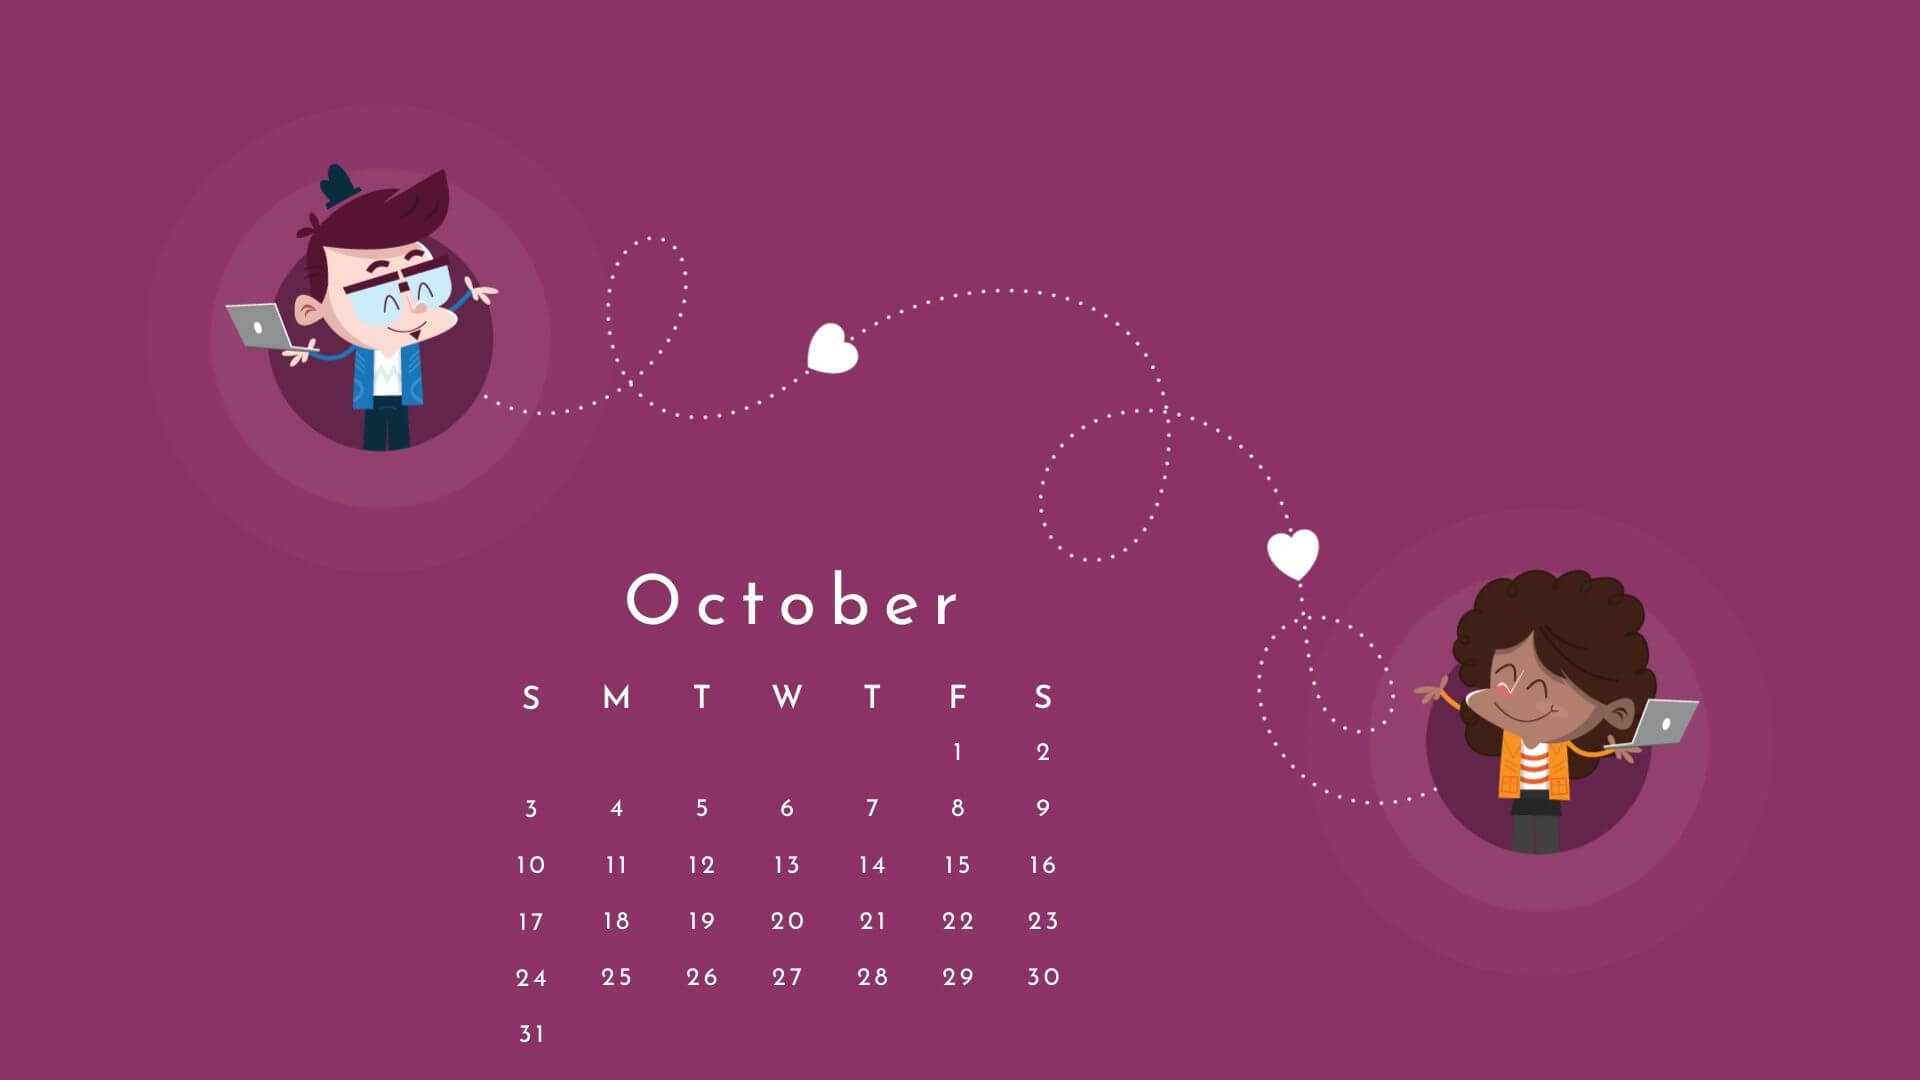 October 2021 Desktop Calendar Wallpaper